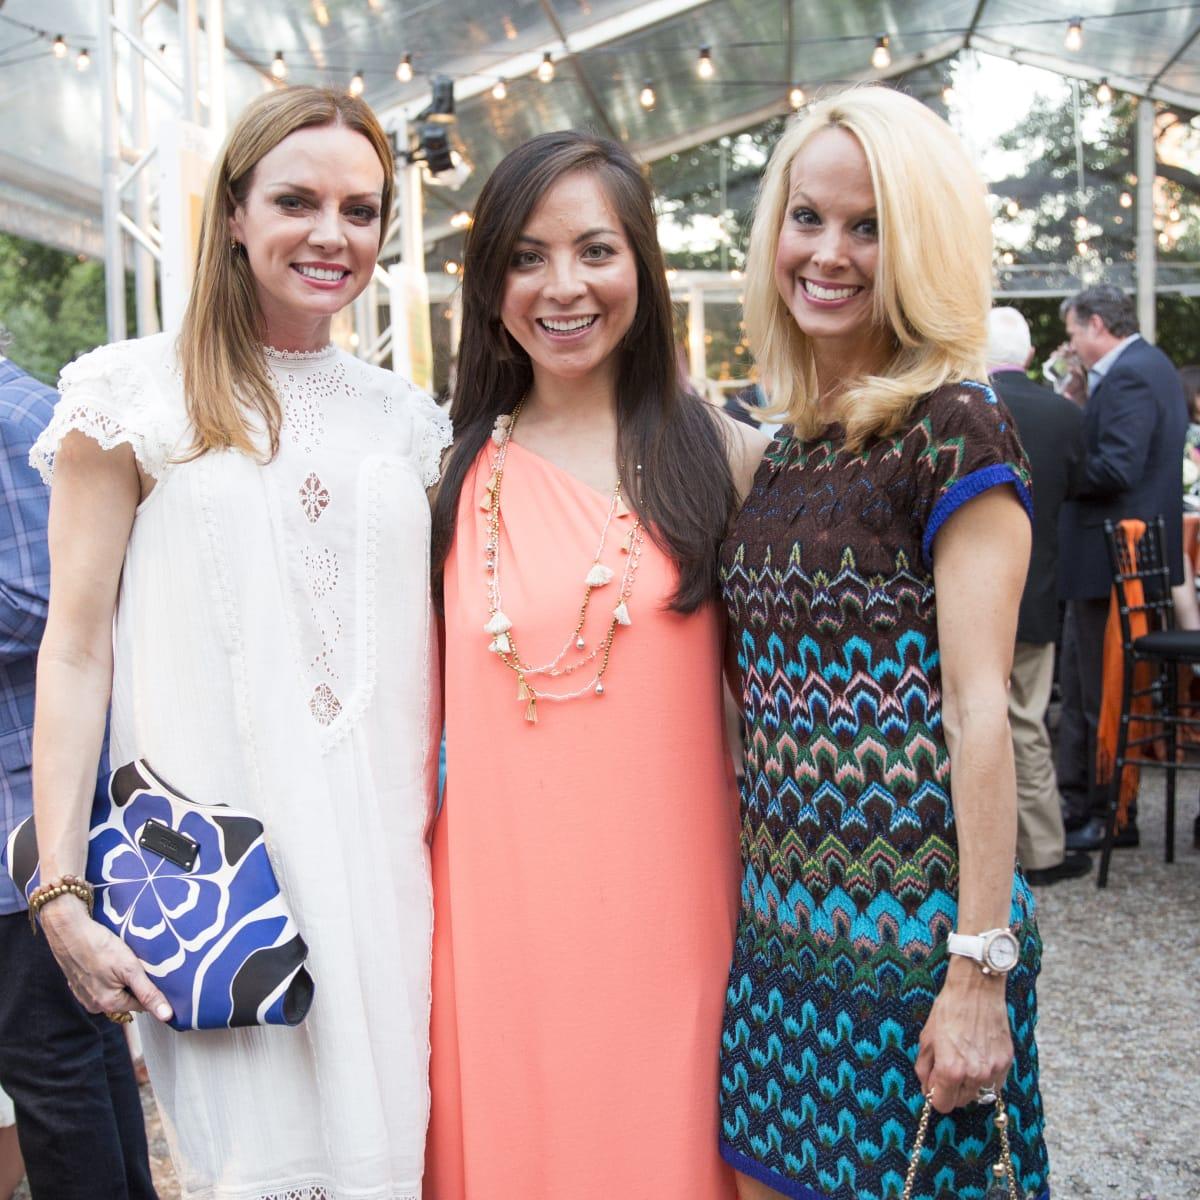 Megan Flanagan, Samantha Wortley, Katy bock